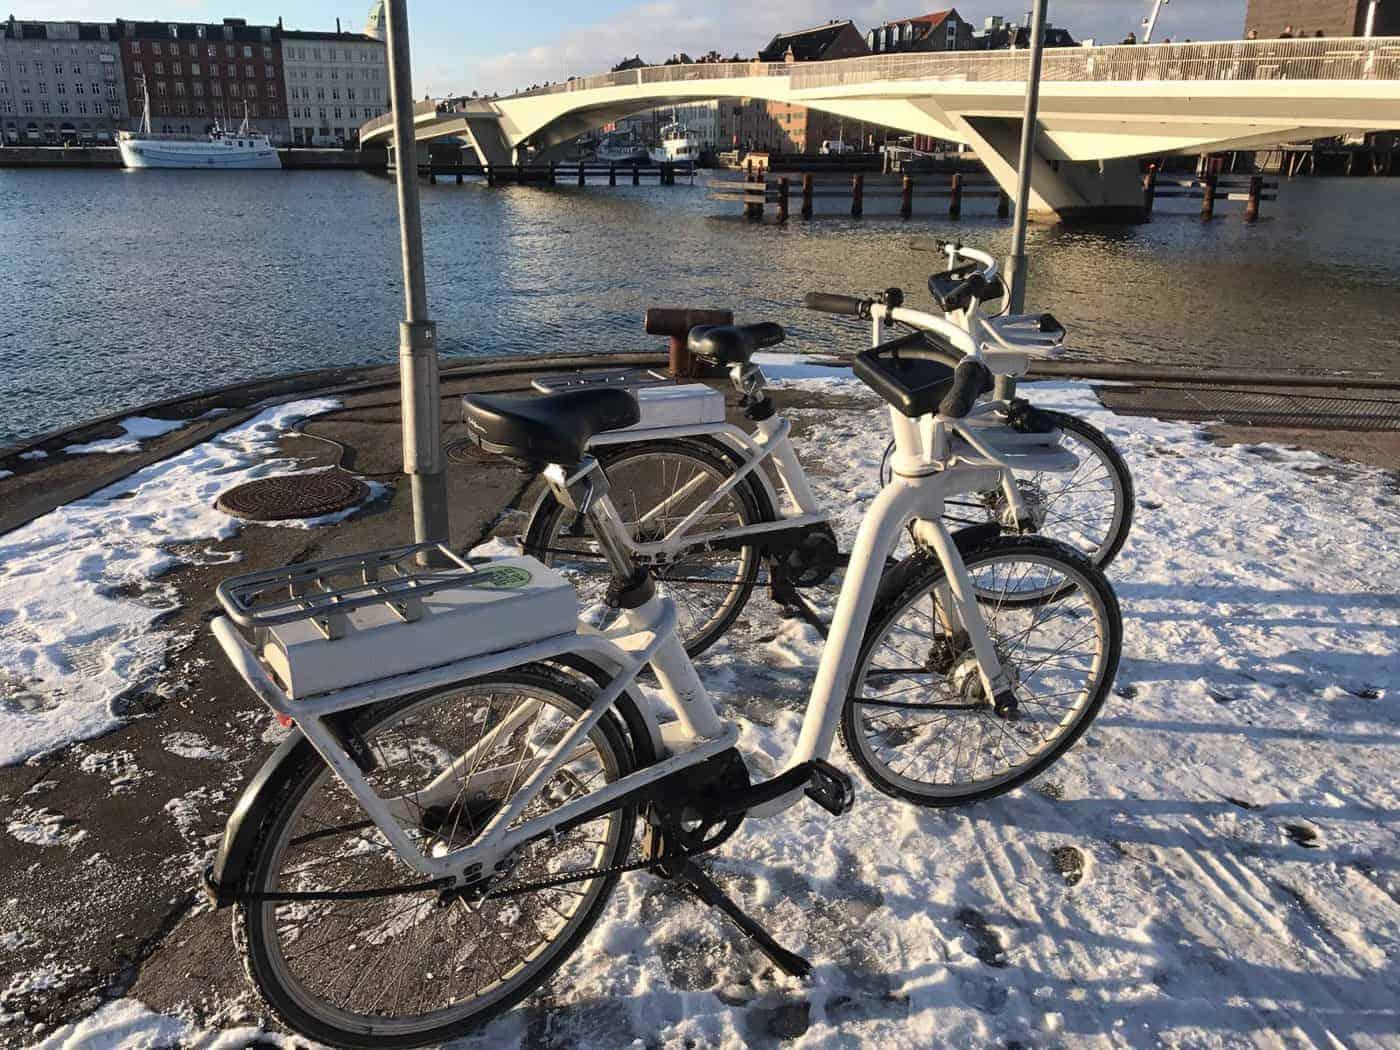 Copenhagen Denmark Travel Guide Itinerary-4